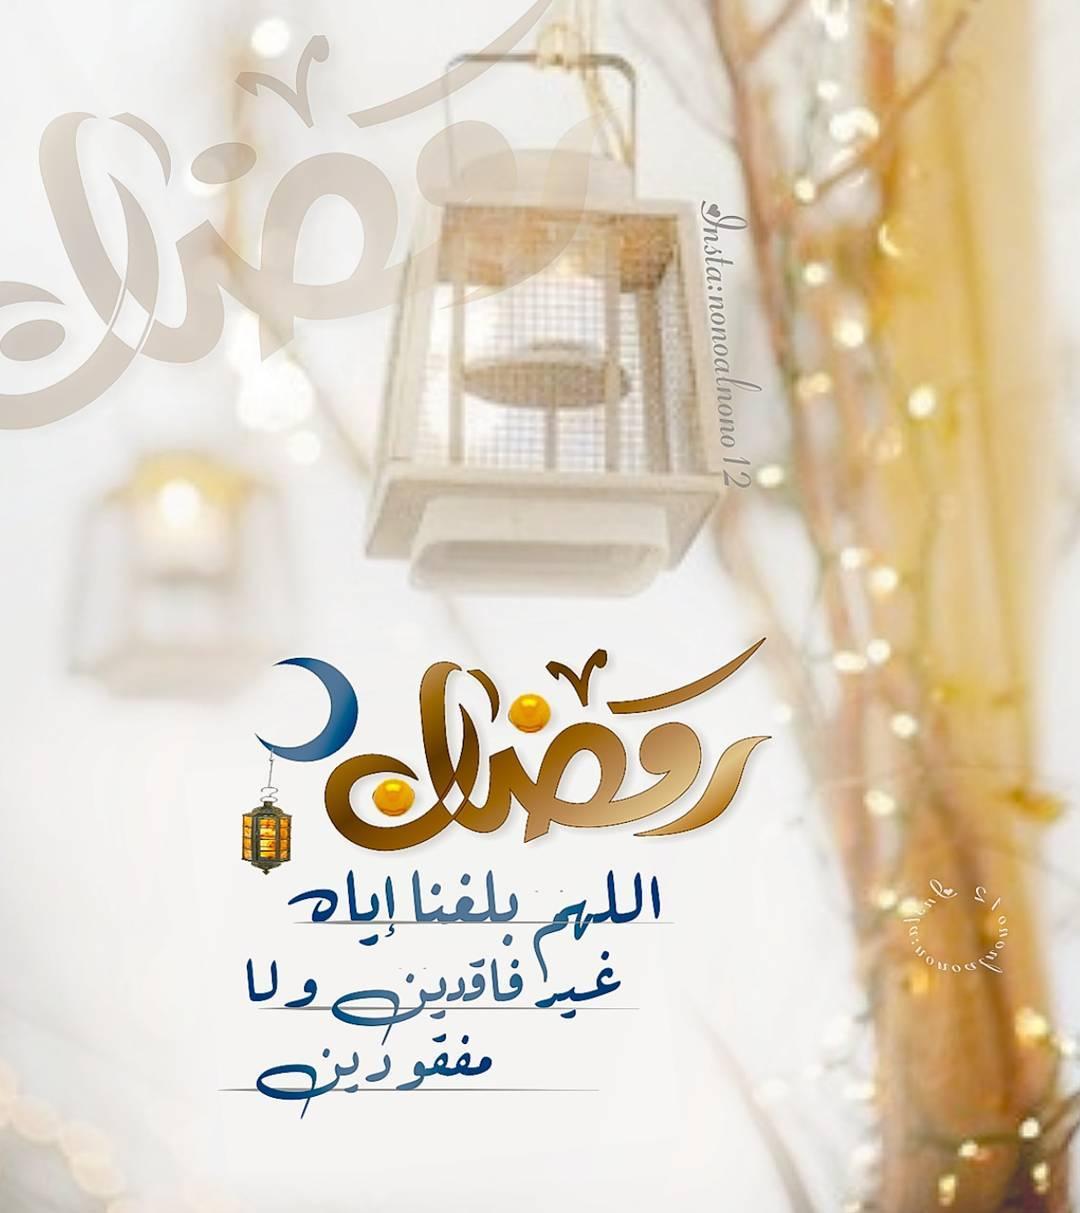 صوره دعاء رمضان 2019 , اجمل ادعية لرمضان